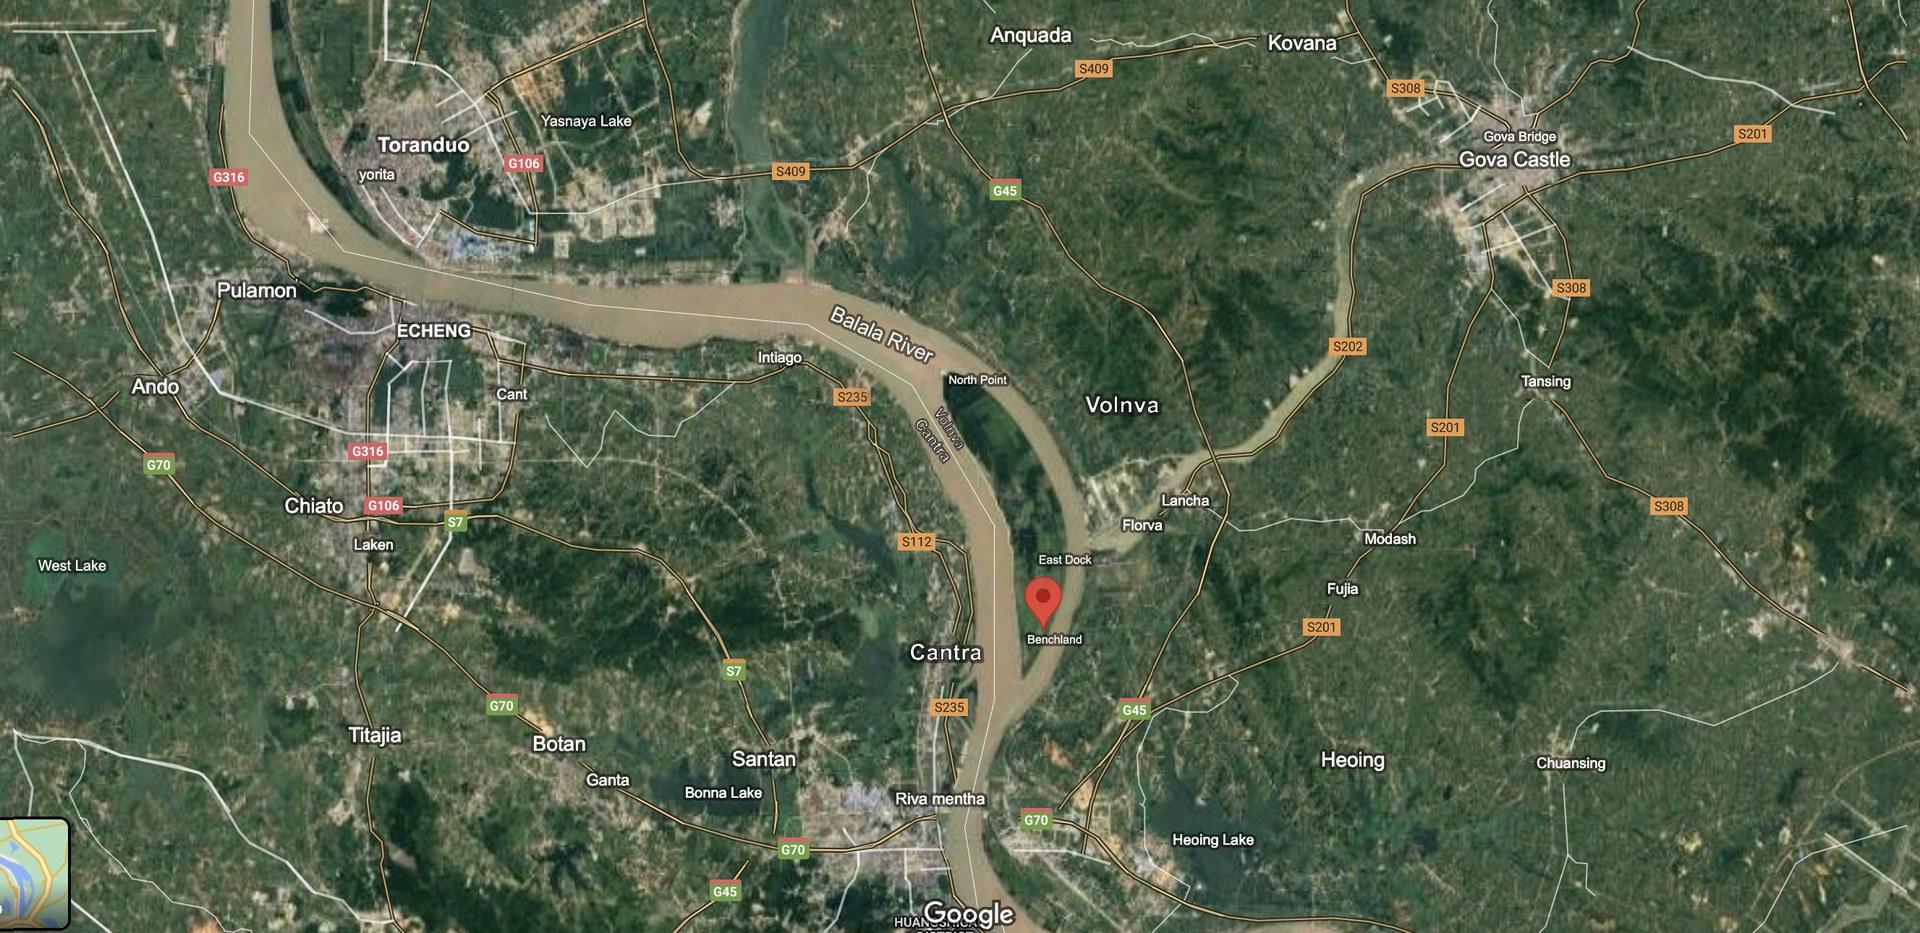 The location of Balala River